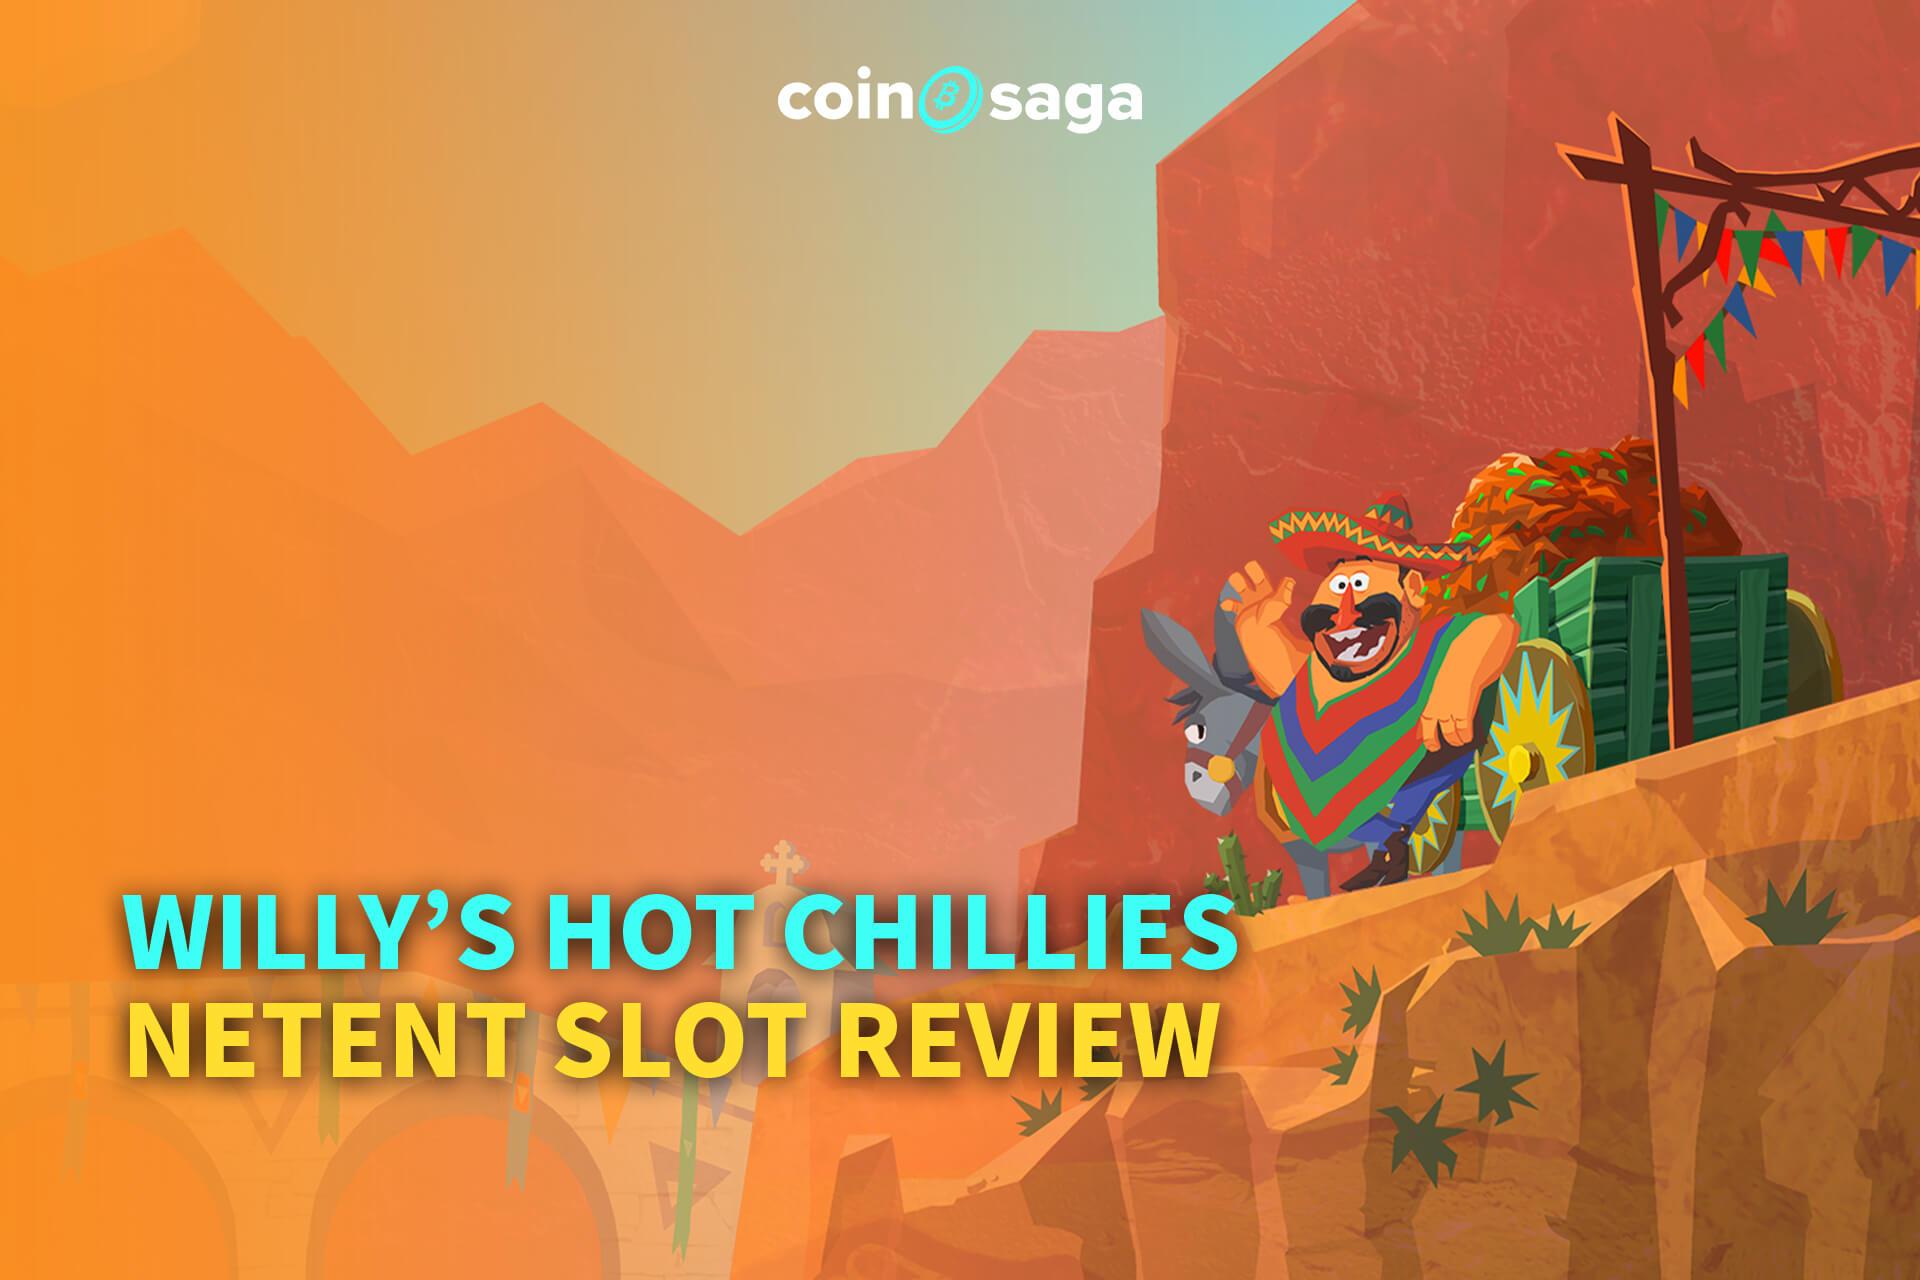 WillyHotChillie slot review